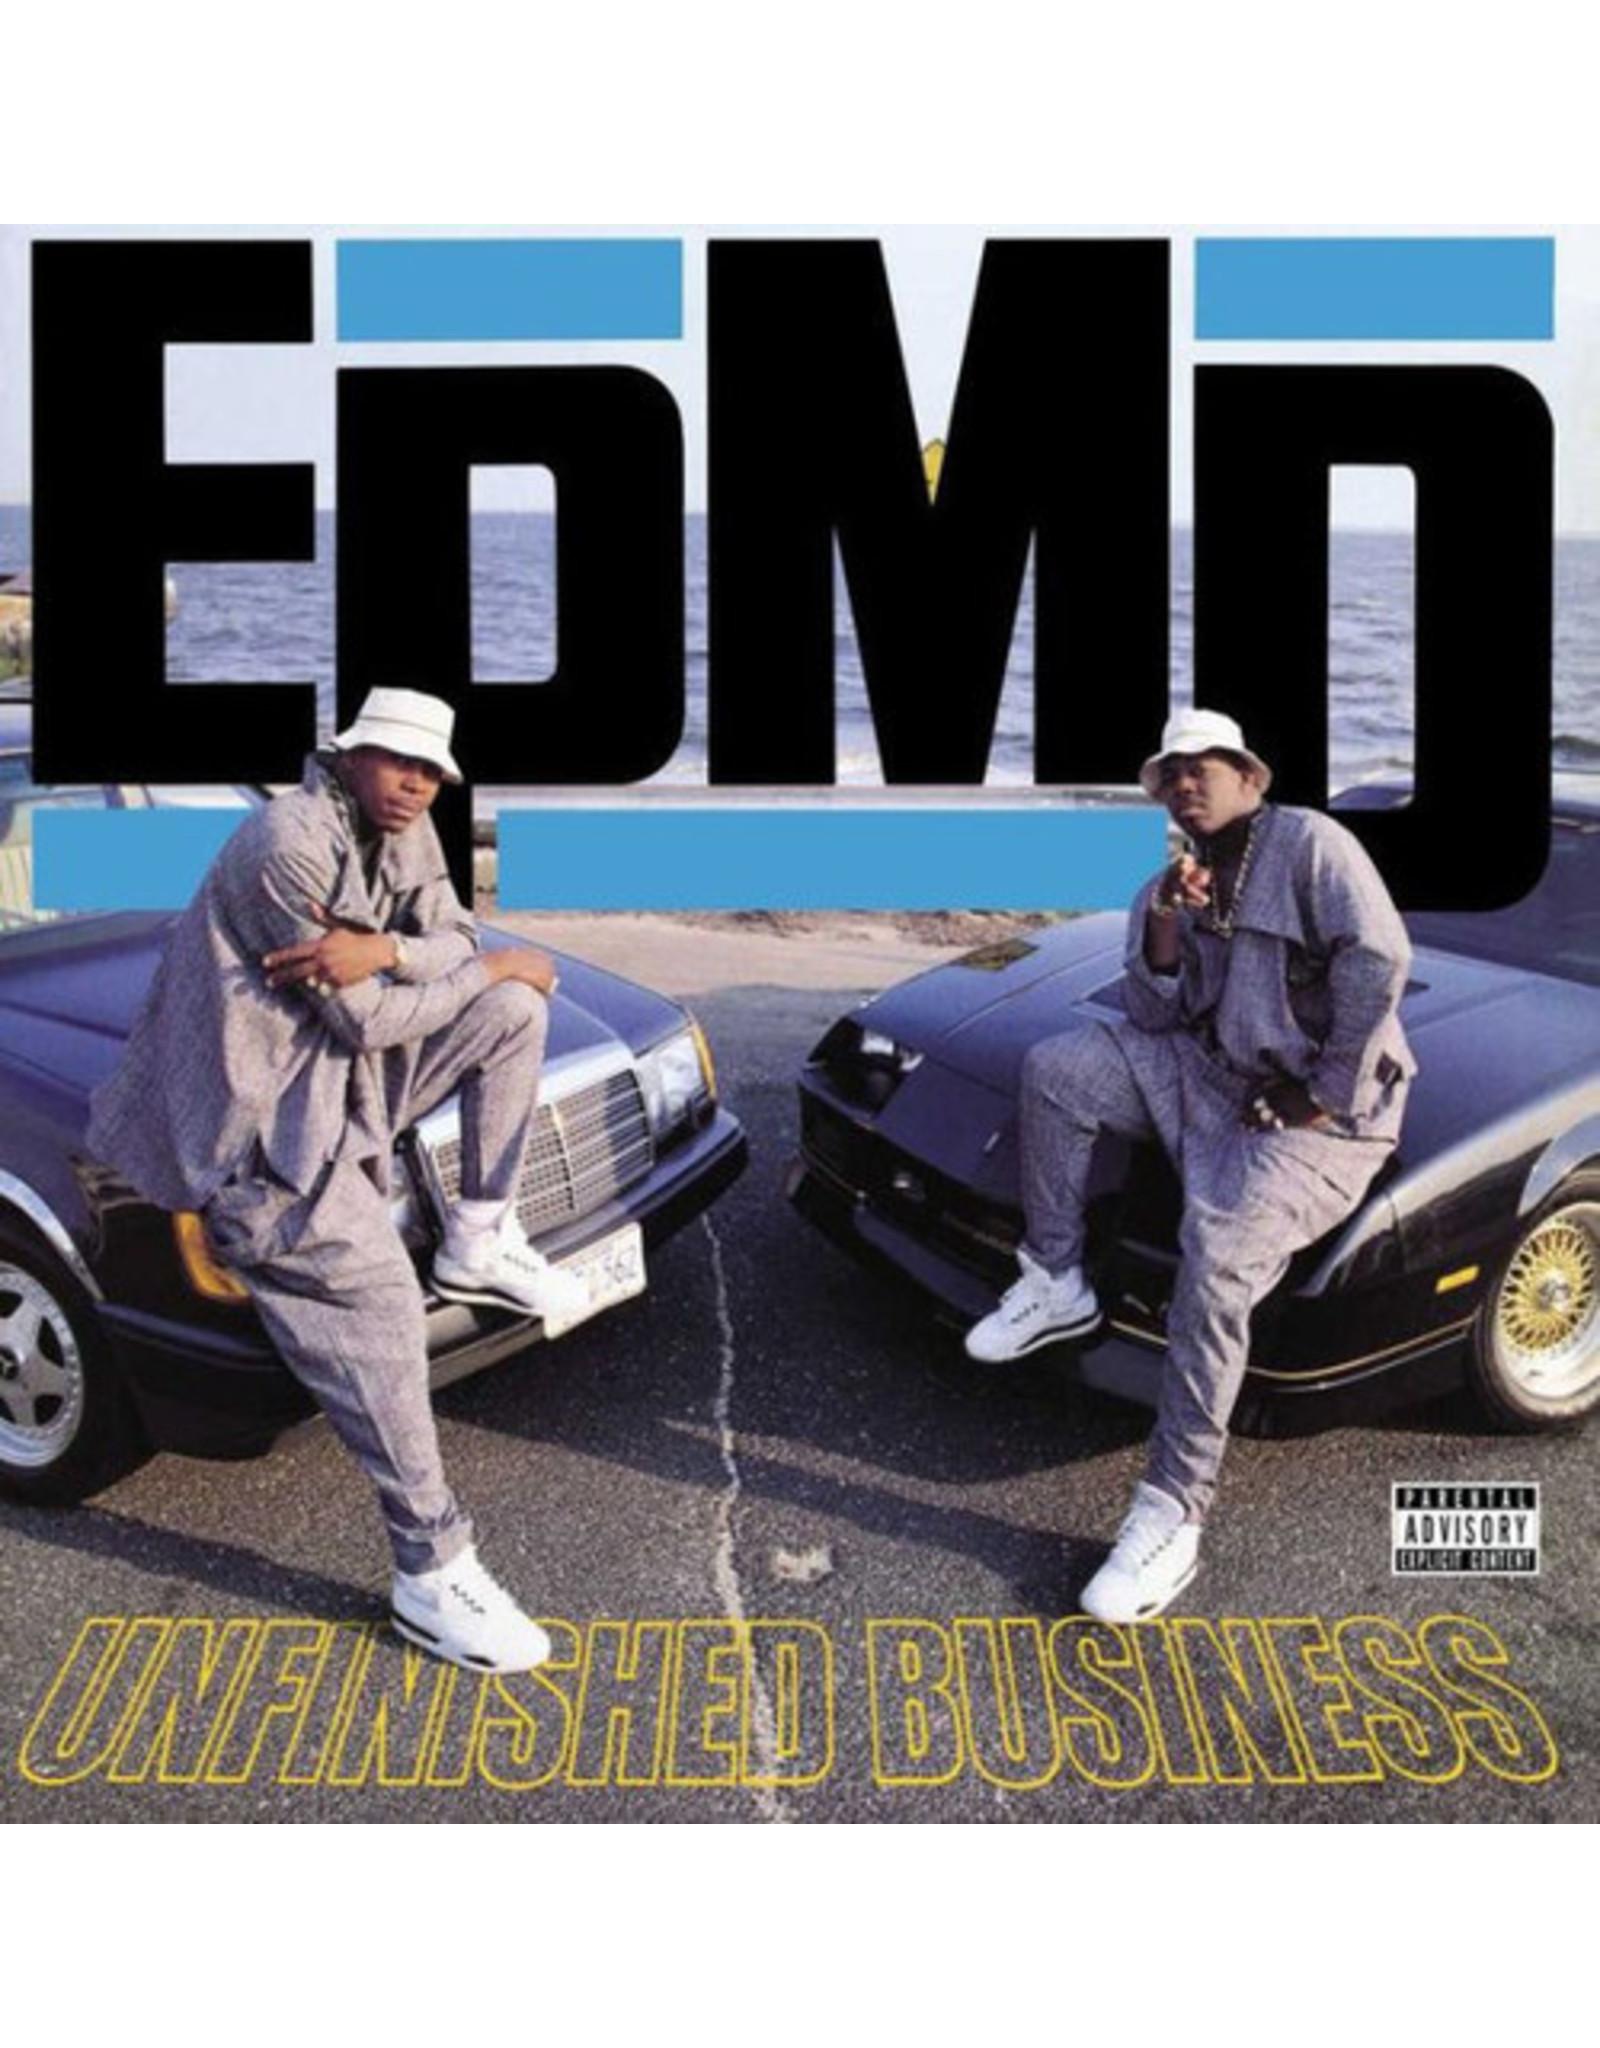 New Vinyl EPMD - Unfinished Business 2LP